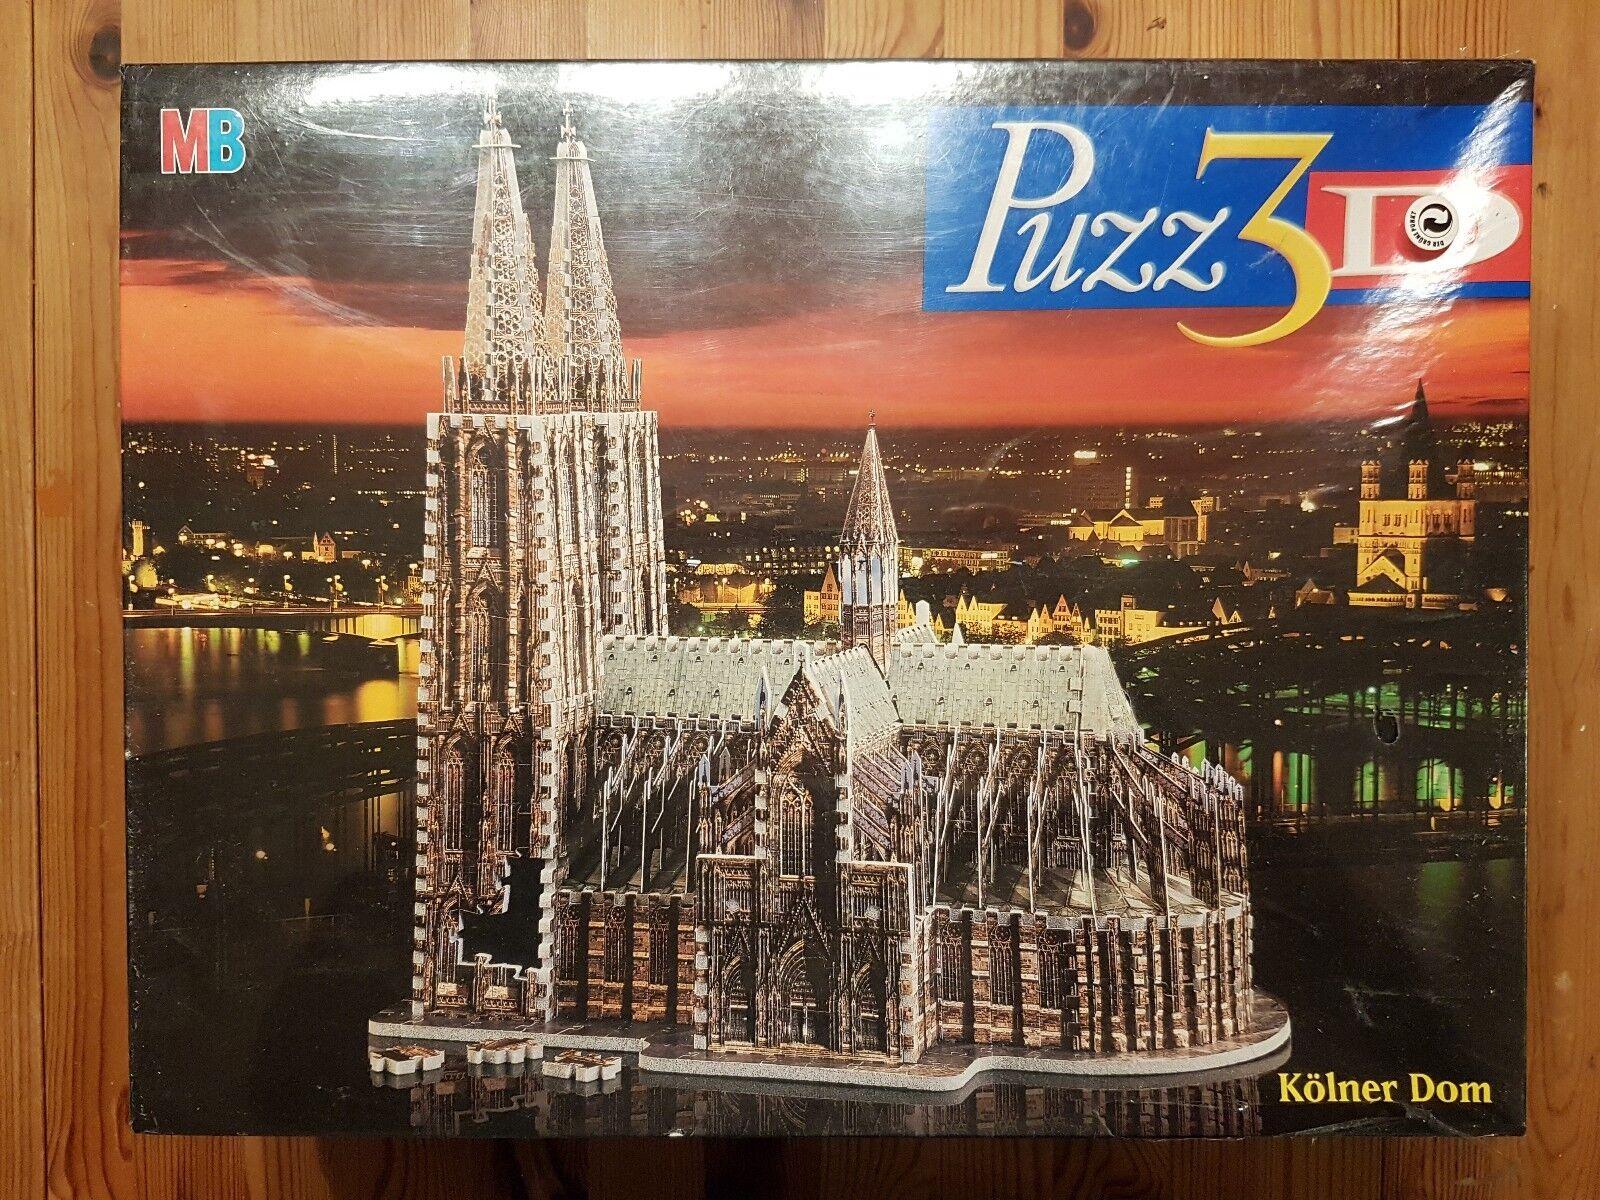 Kölner Dom, 704 Teile, Puzz3D, MB, NEU, OVP, SELTEN